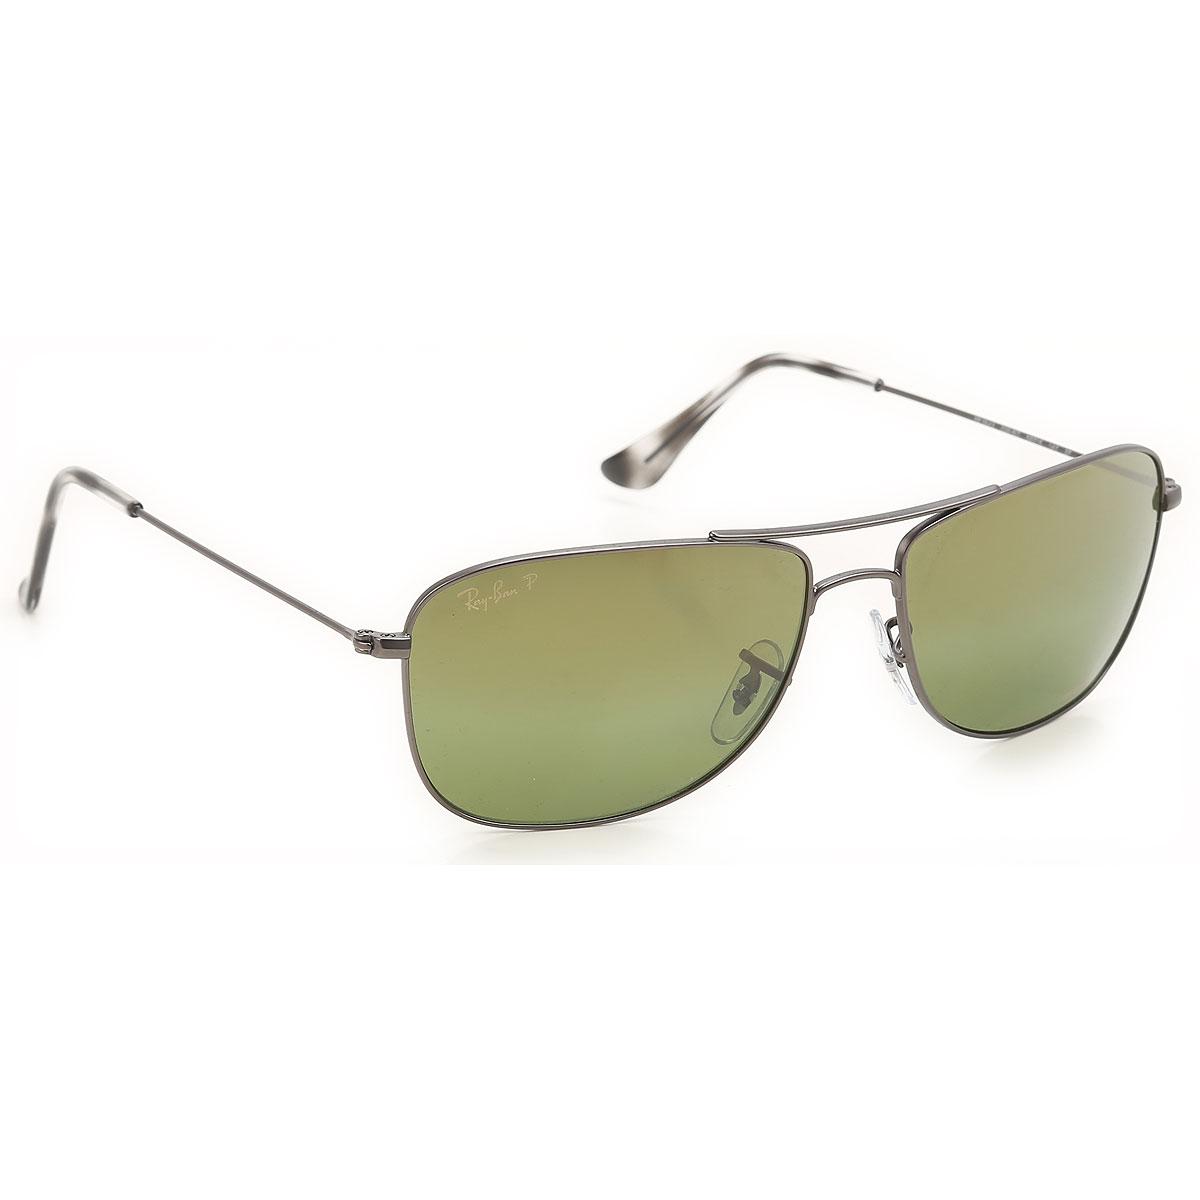 Ray Ban Sunglasses On Sale, Ruthenium, 2019